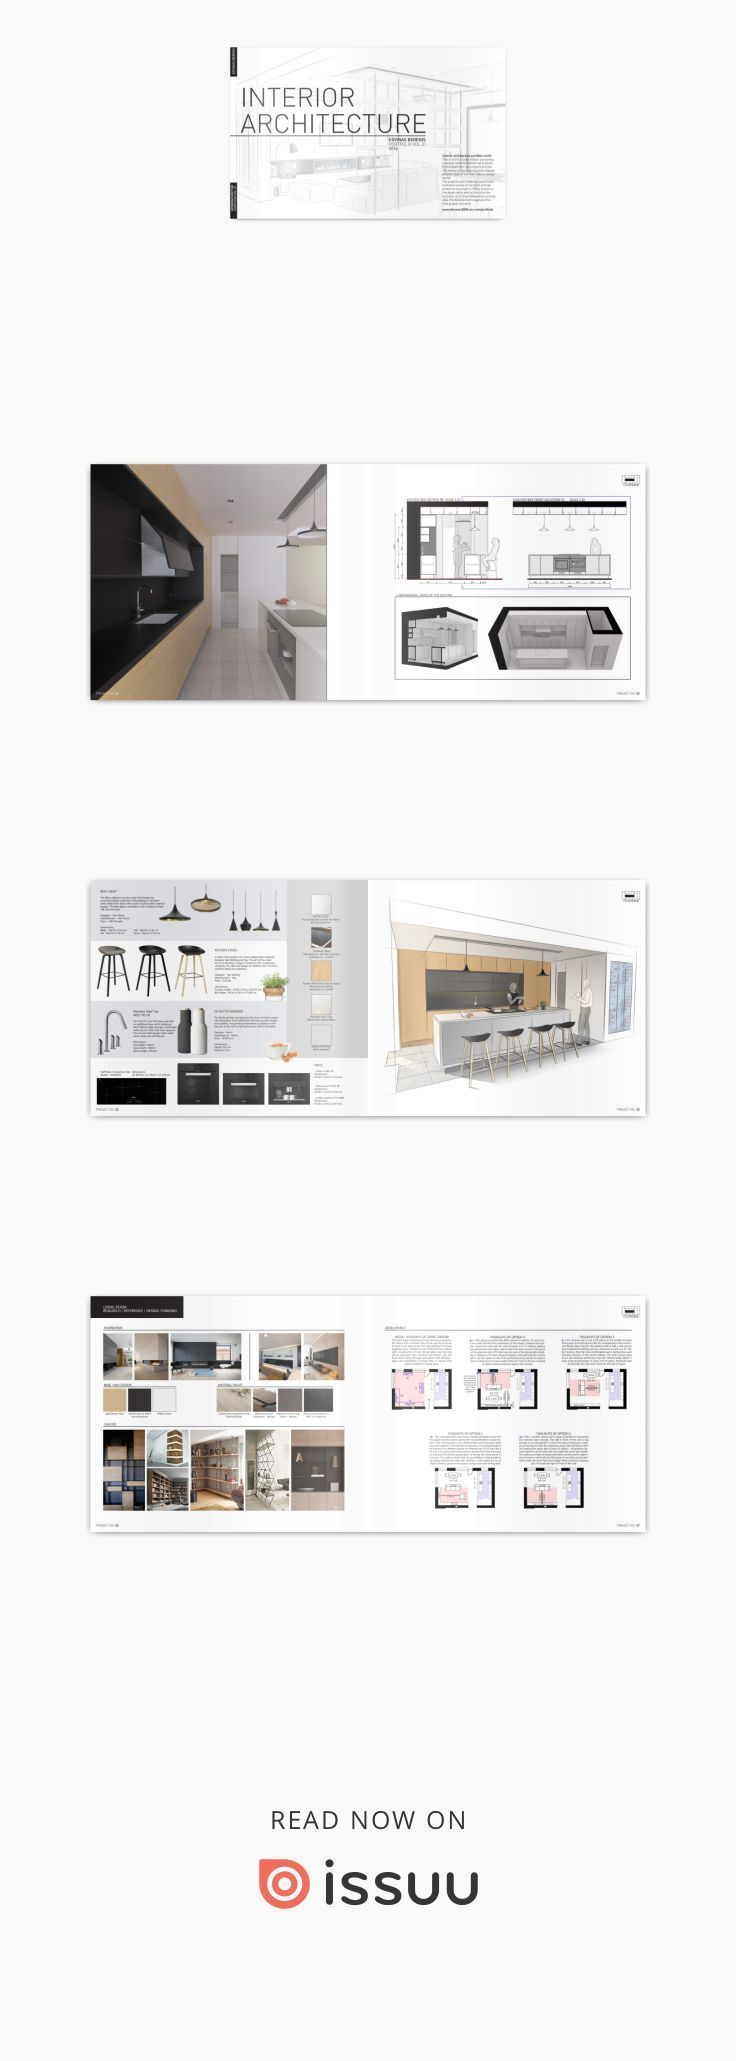 Innenarchitektur - #Innenarchitektur #portfolio #arquitectonico